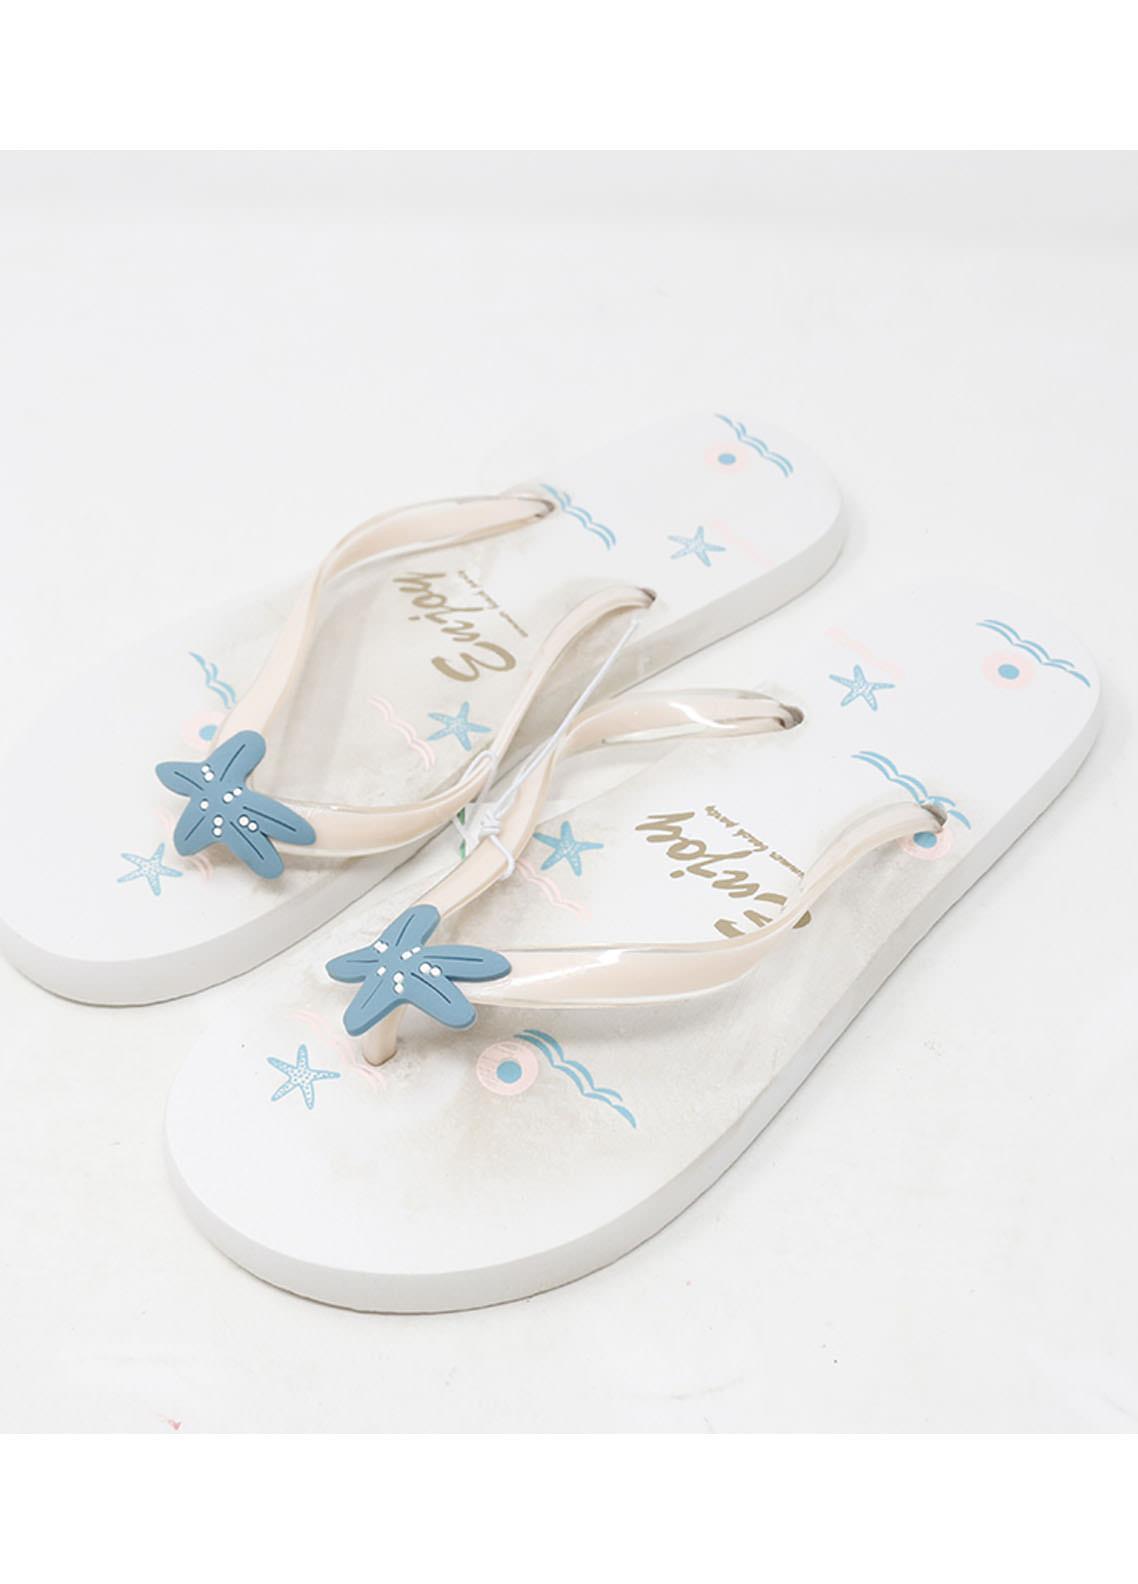 Mumuso Casual Style  Flat Flip Flop 02 STARFISH